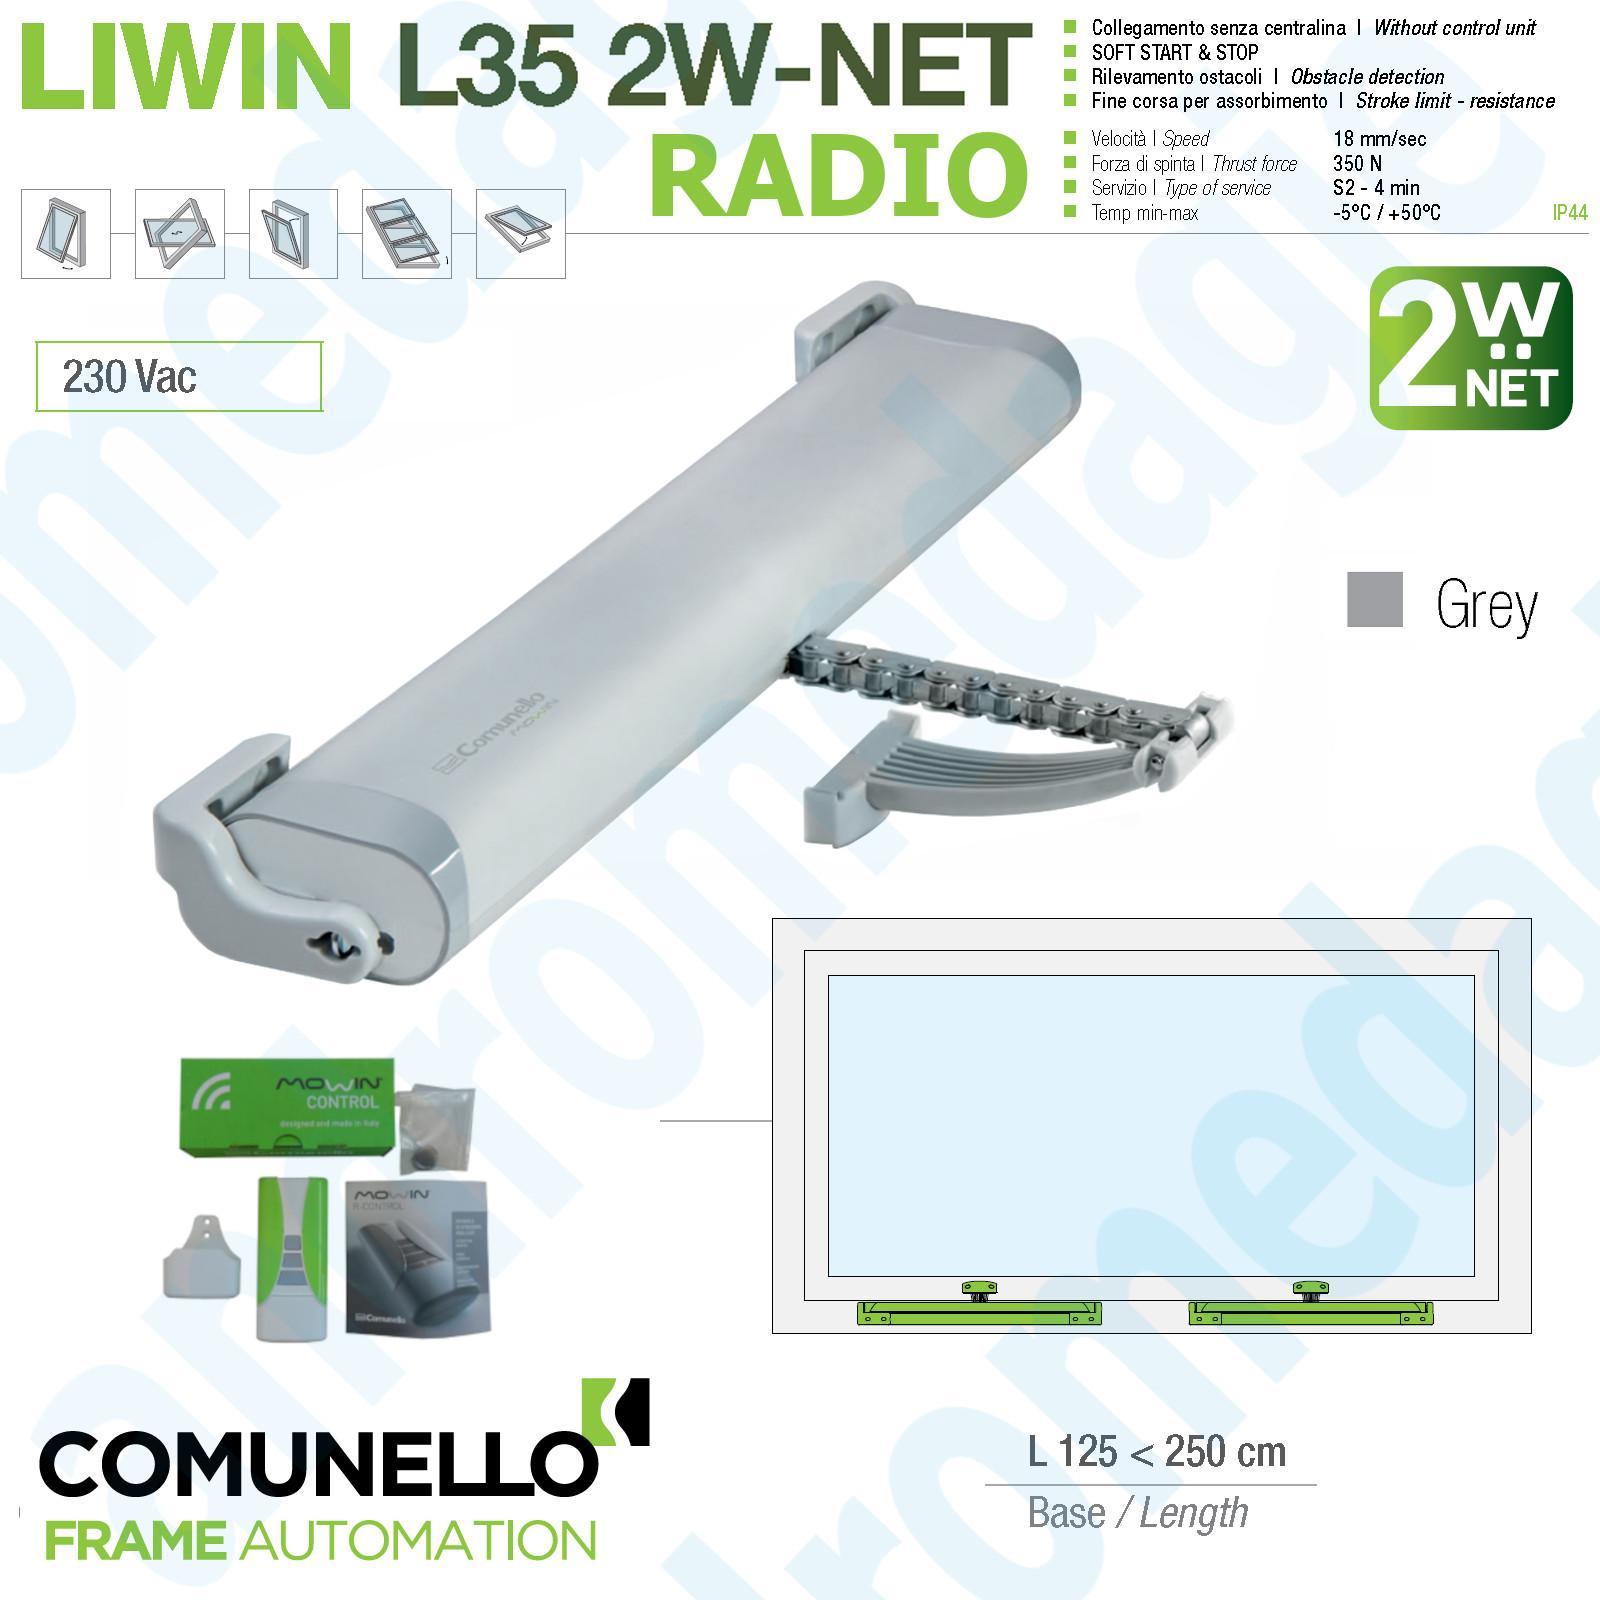 LIWIN 2W-NET RADIO 350N 230V GRIGIO + R1 CONTROL VERDE + STAFFE ABBAINO